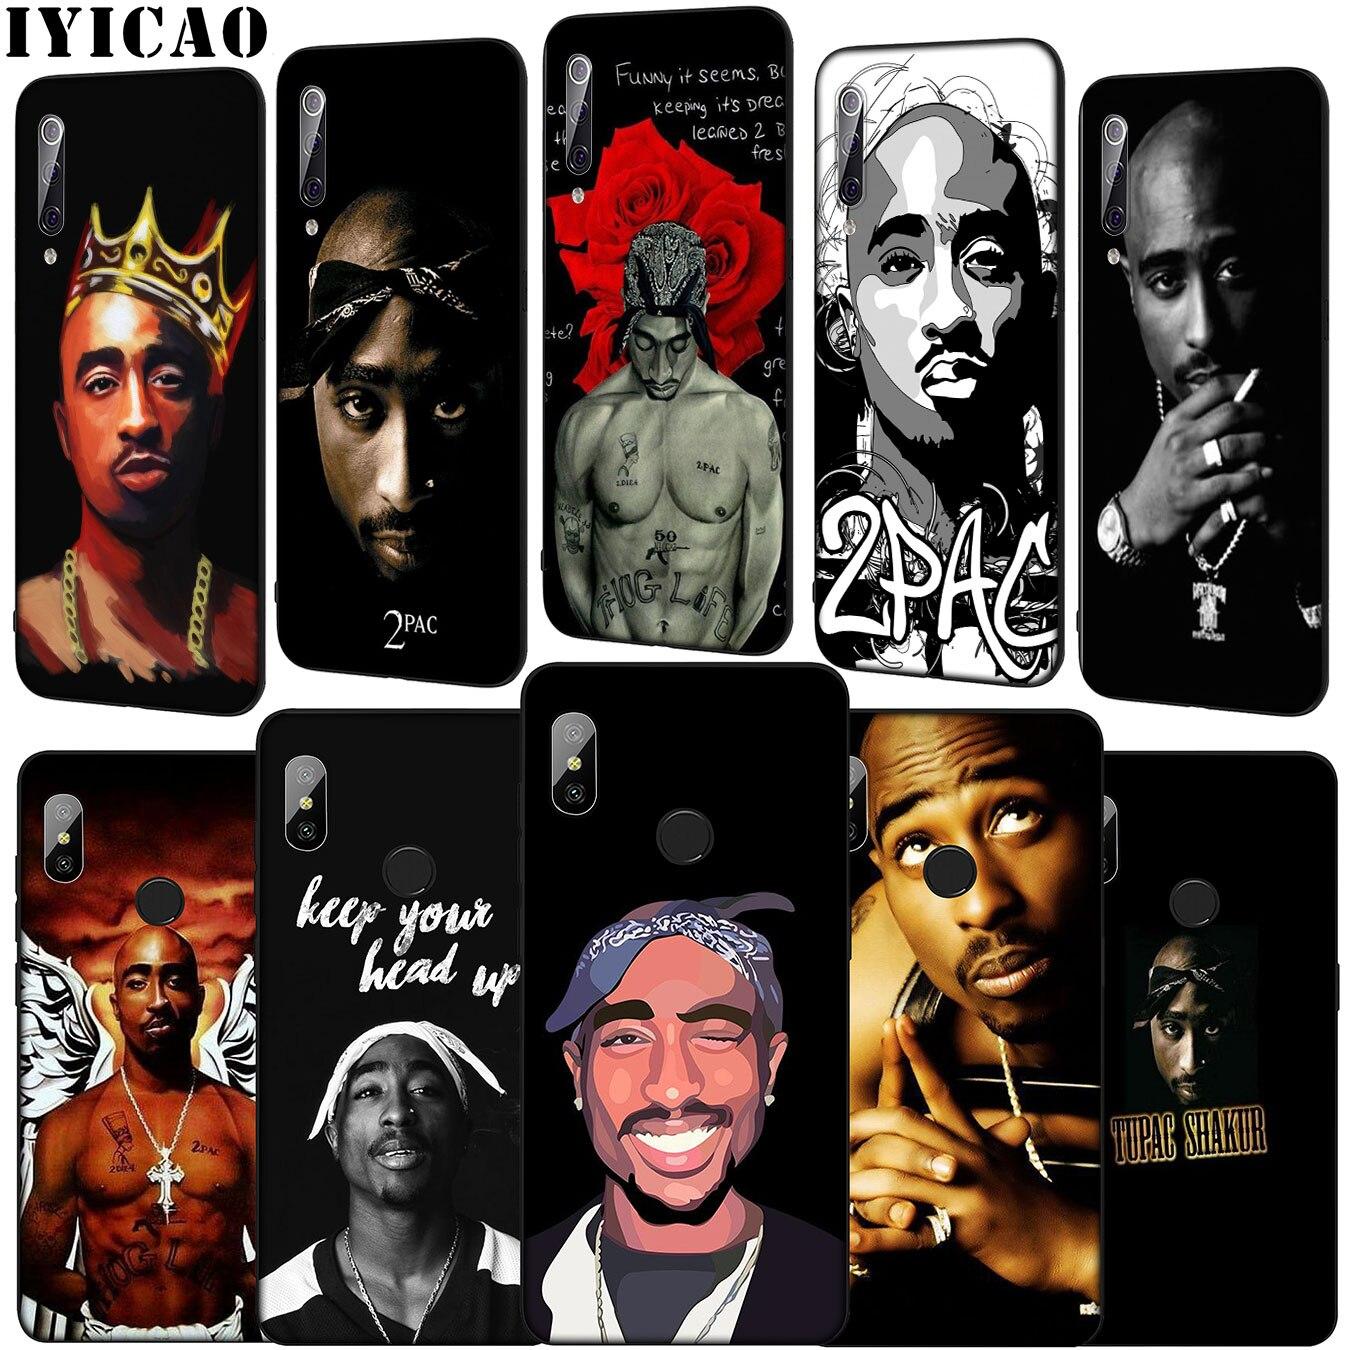 2pac Tupac rapero estuche para teléfono suave para Xiaomi mi 9 9T A3 PRO CC9 CC9E 8 A2 Lite A1 6 6X 5X teléfono móvil f1 MAX 3